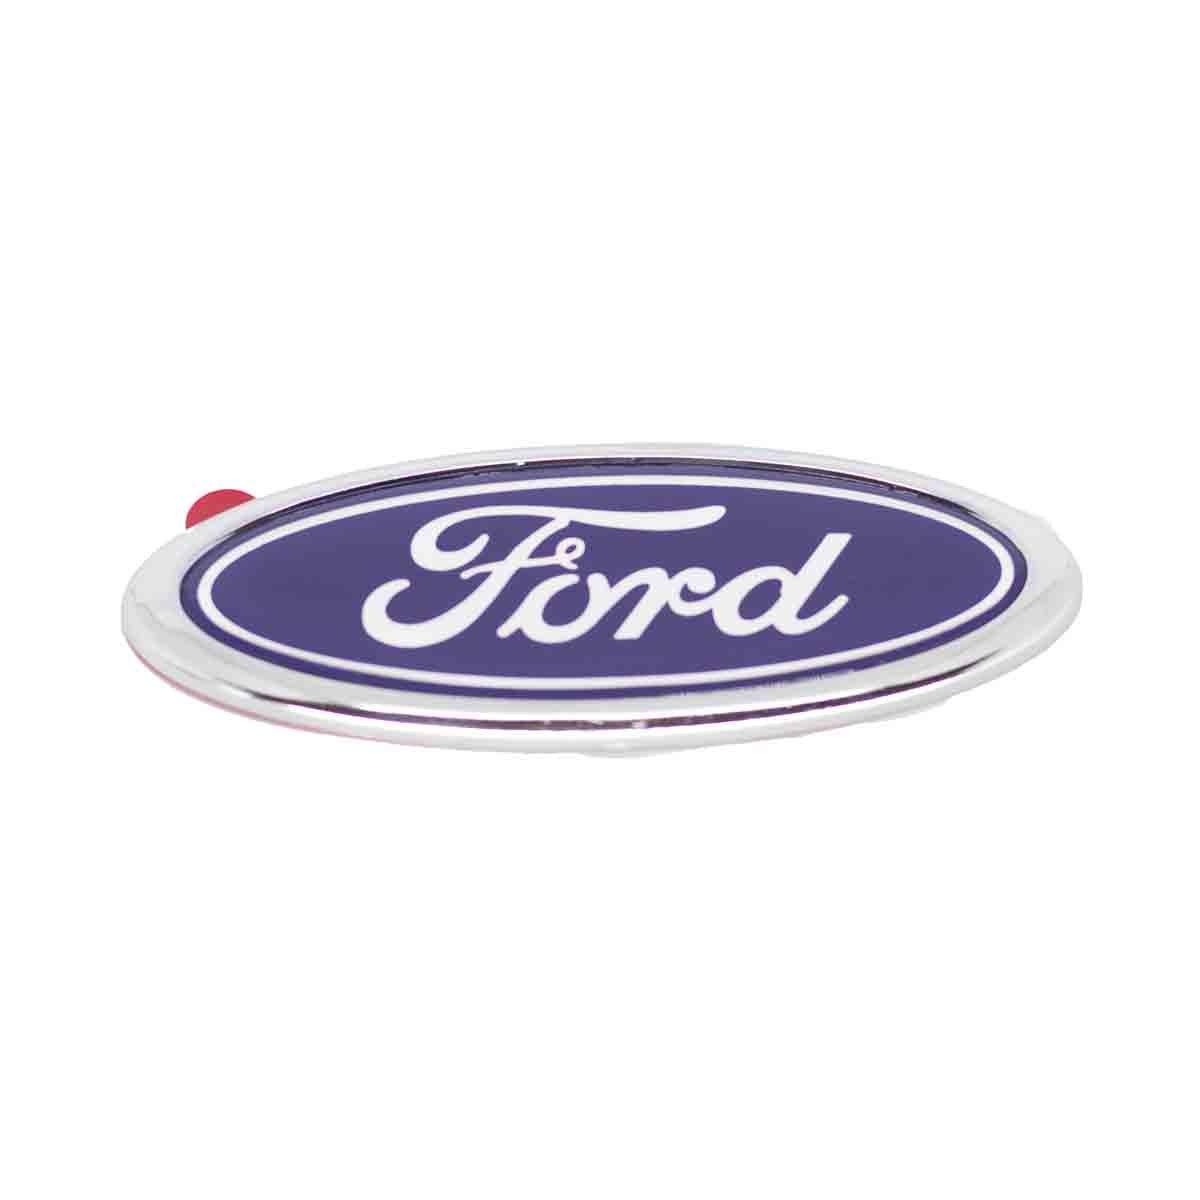 Emblema Ford Oval Malas Ecosport